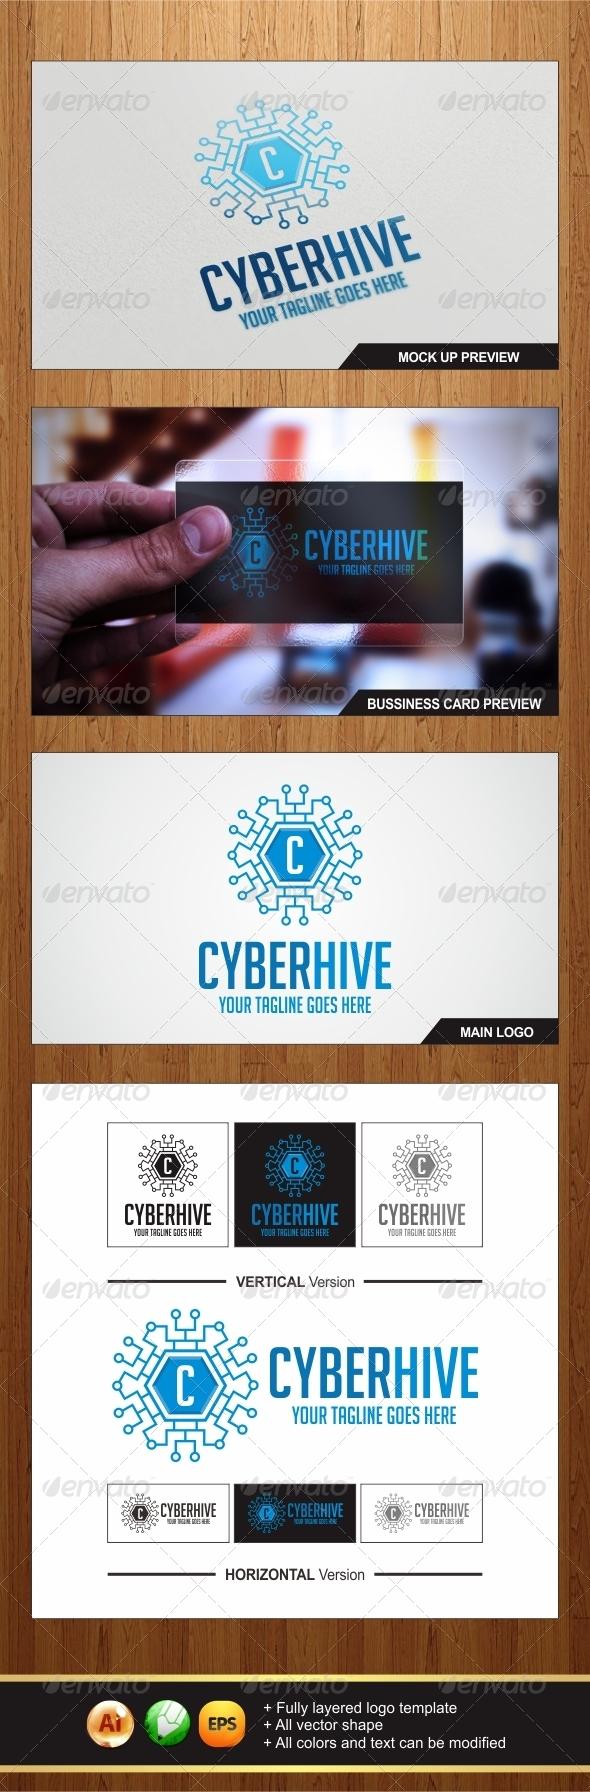 cyber-hiva